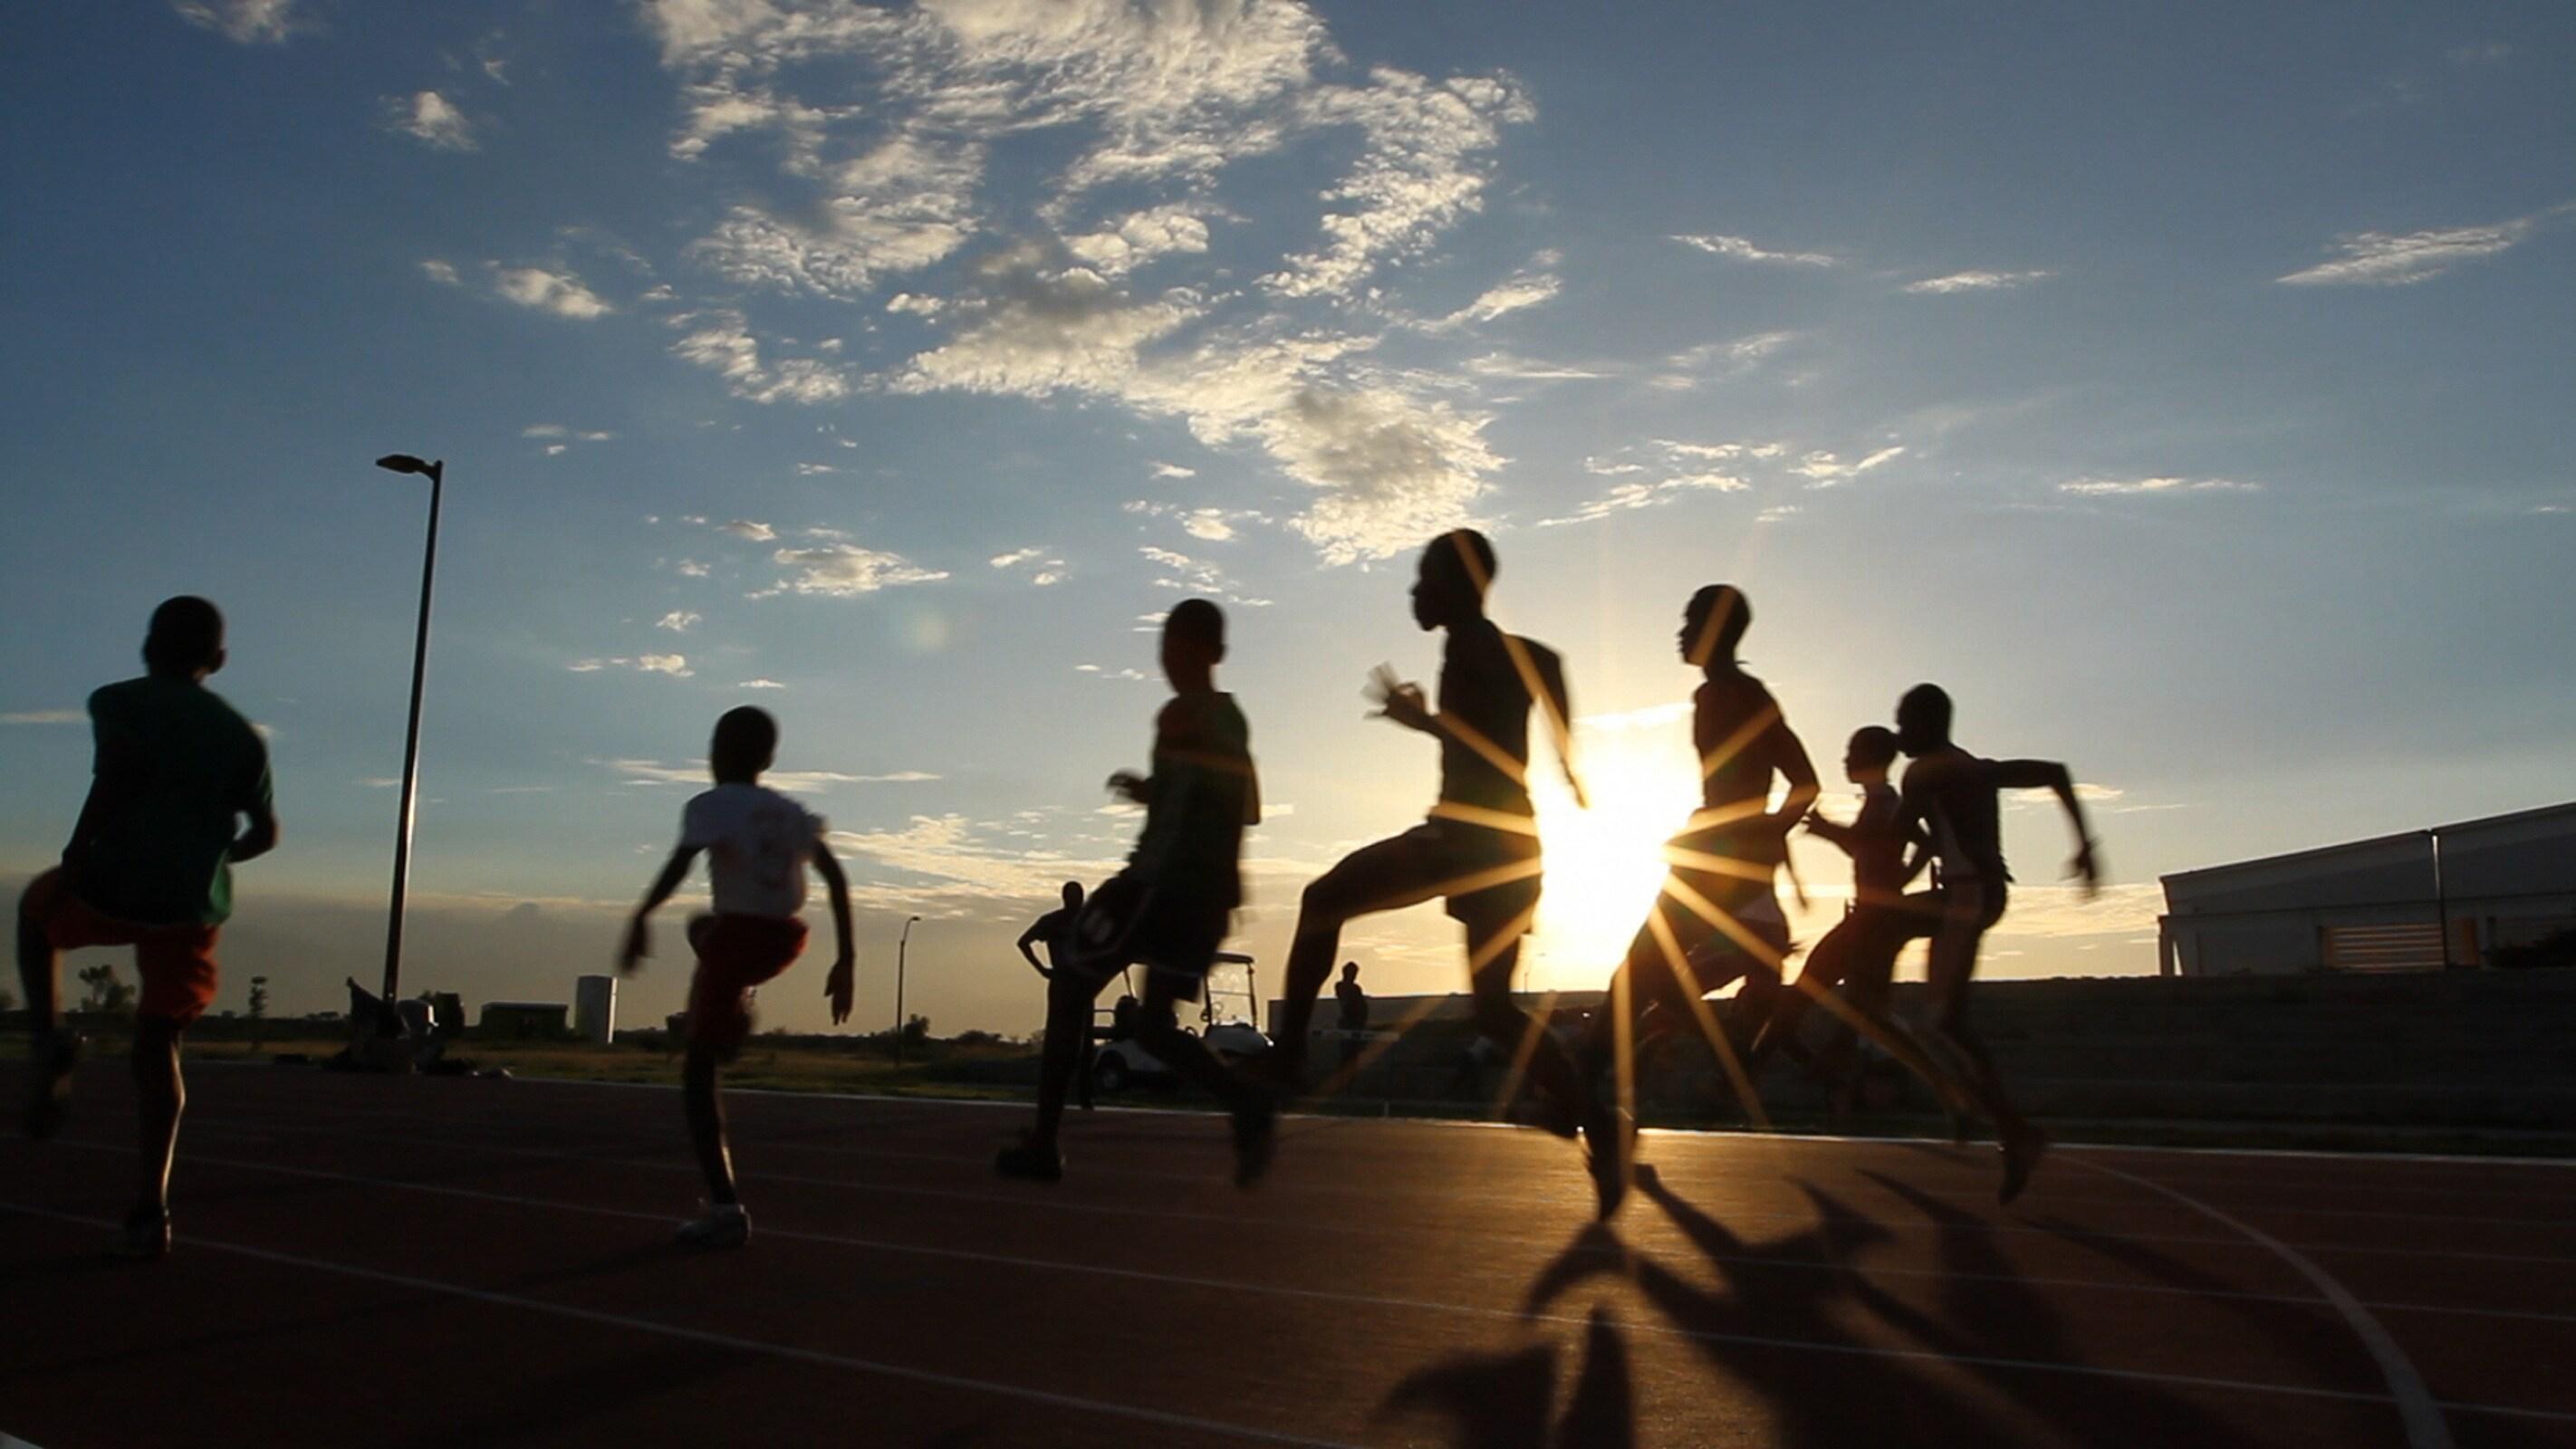 IOC SPORT FOR HOPE PROGRAMME. PORT-AU-PRINCE (HAITI), 2016.